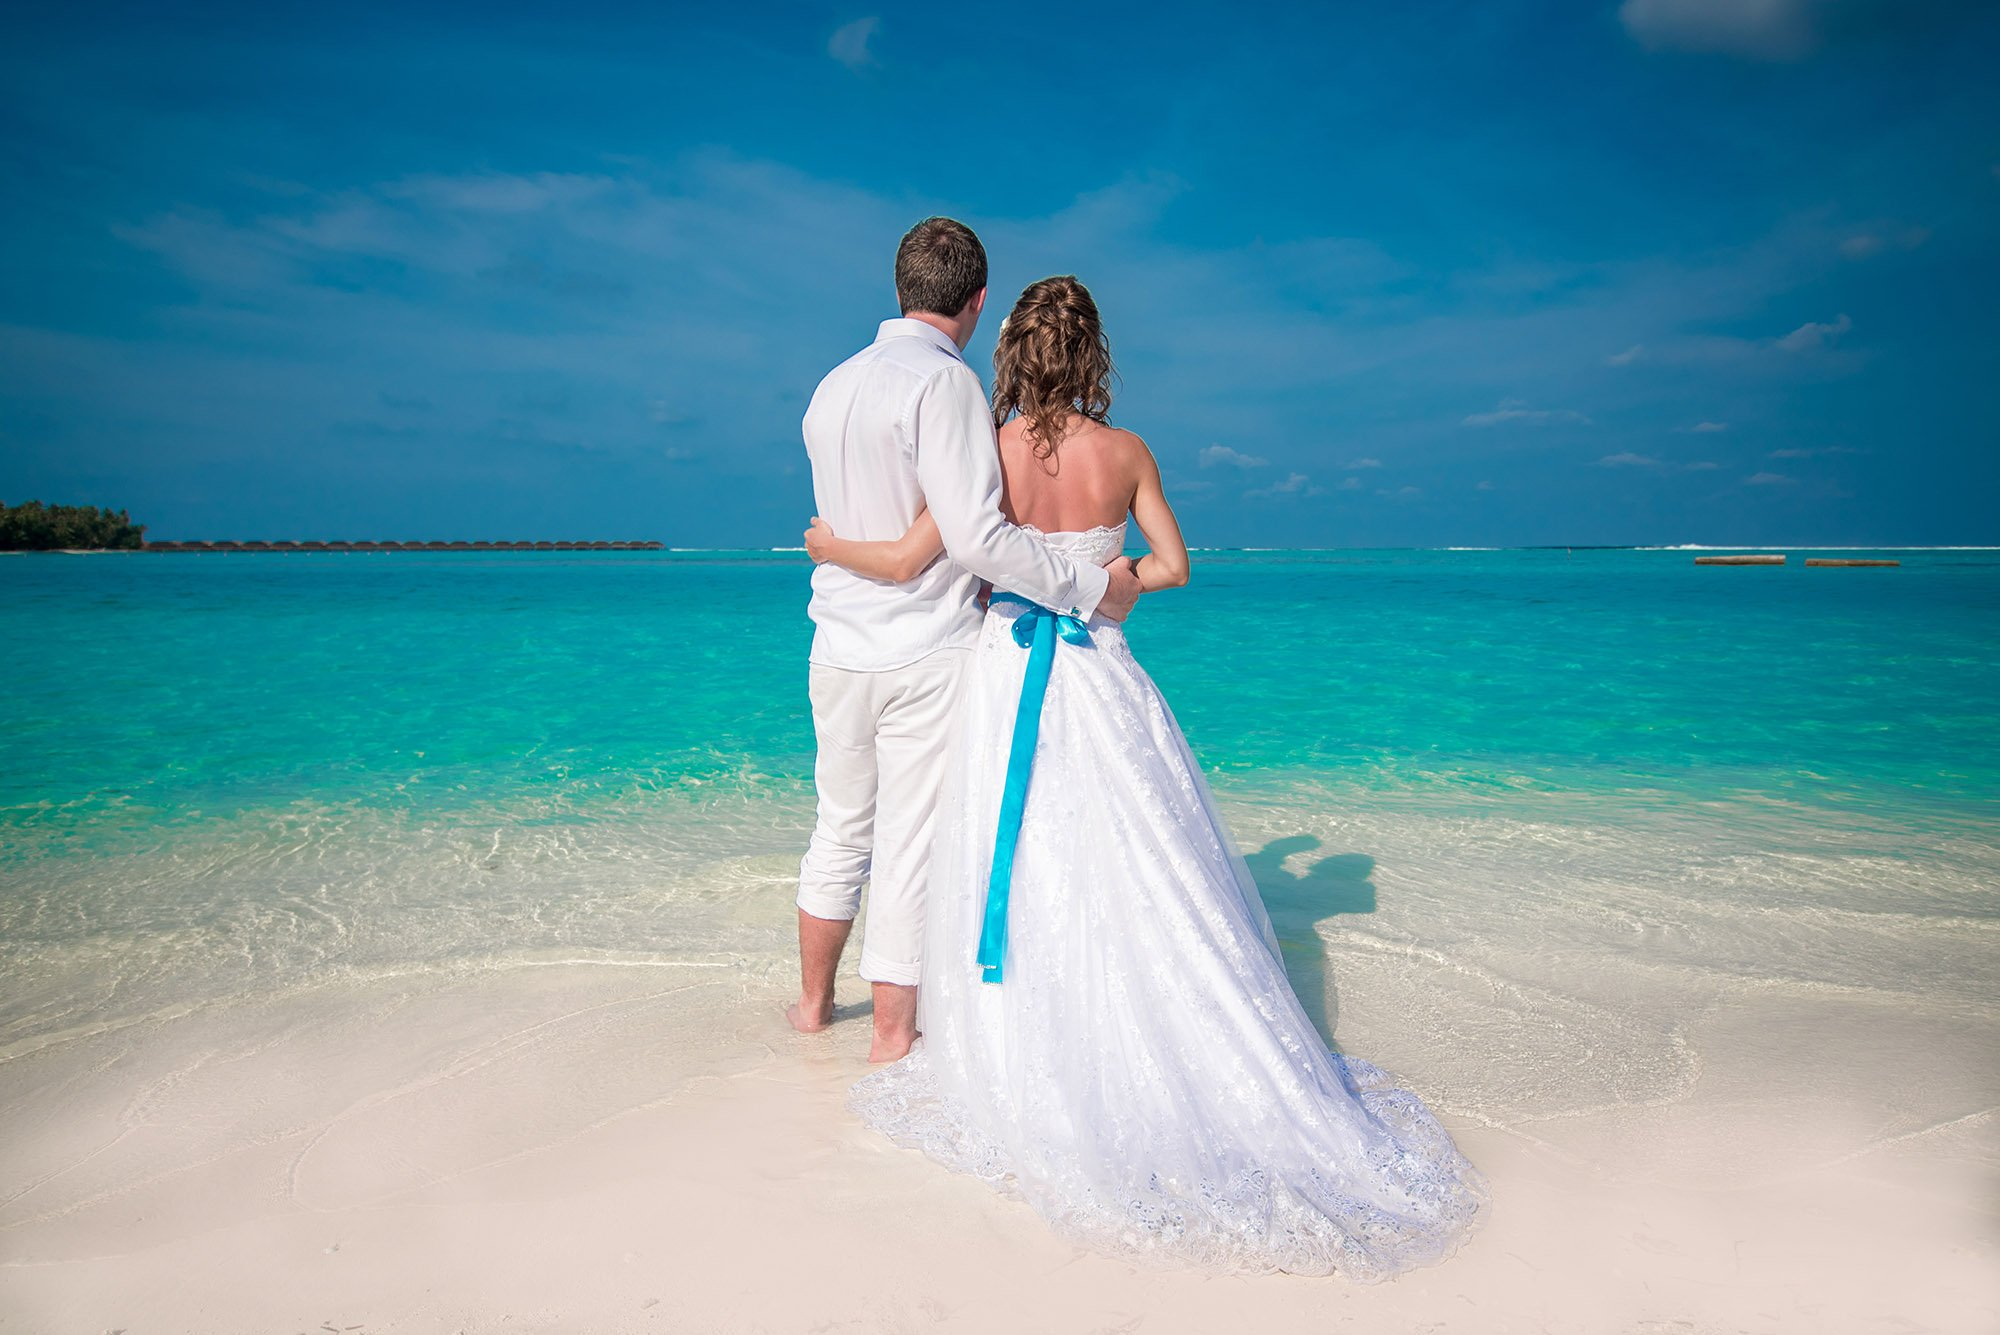 может фото со свадебного путешествия стих взял фотокамеру